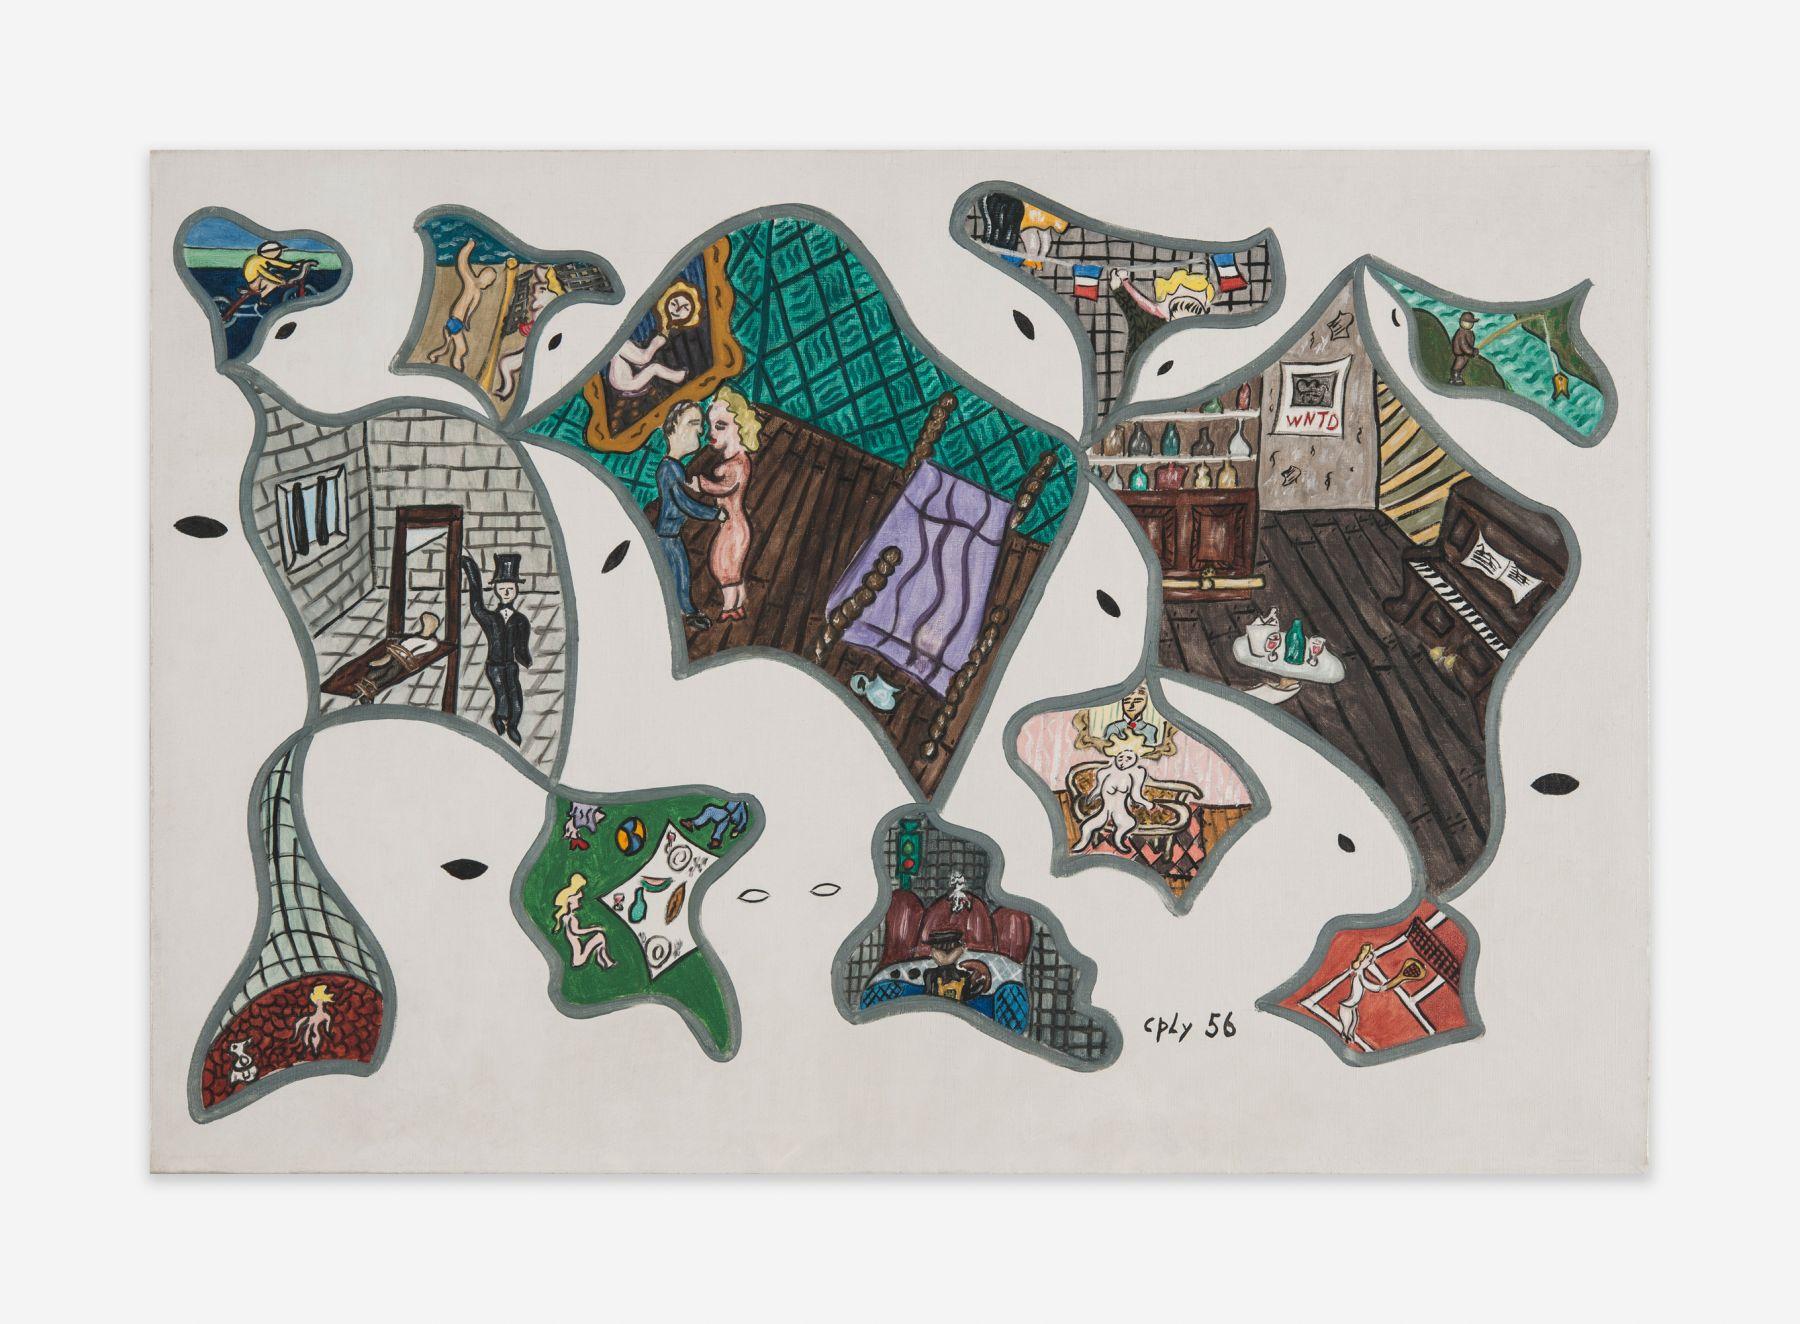 William Copley Untitled, 1956